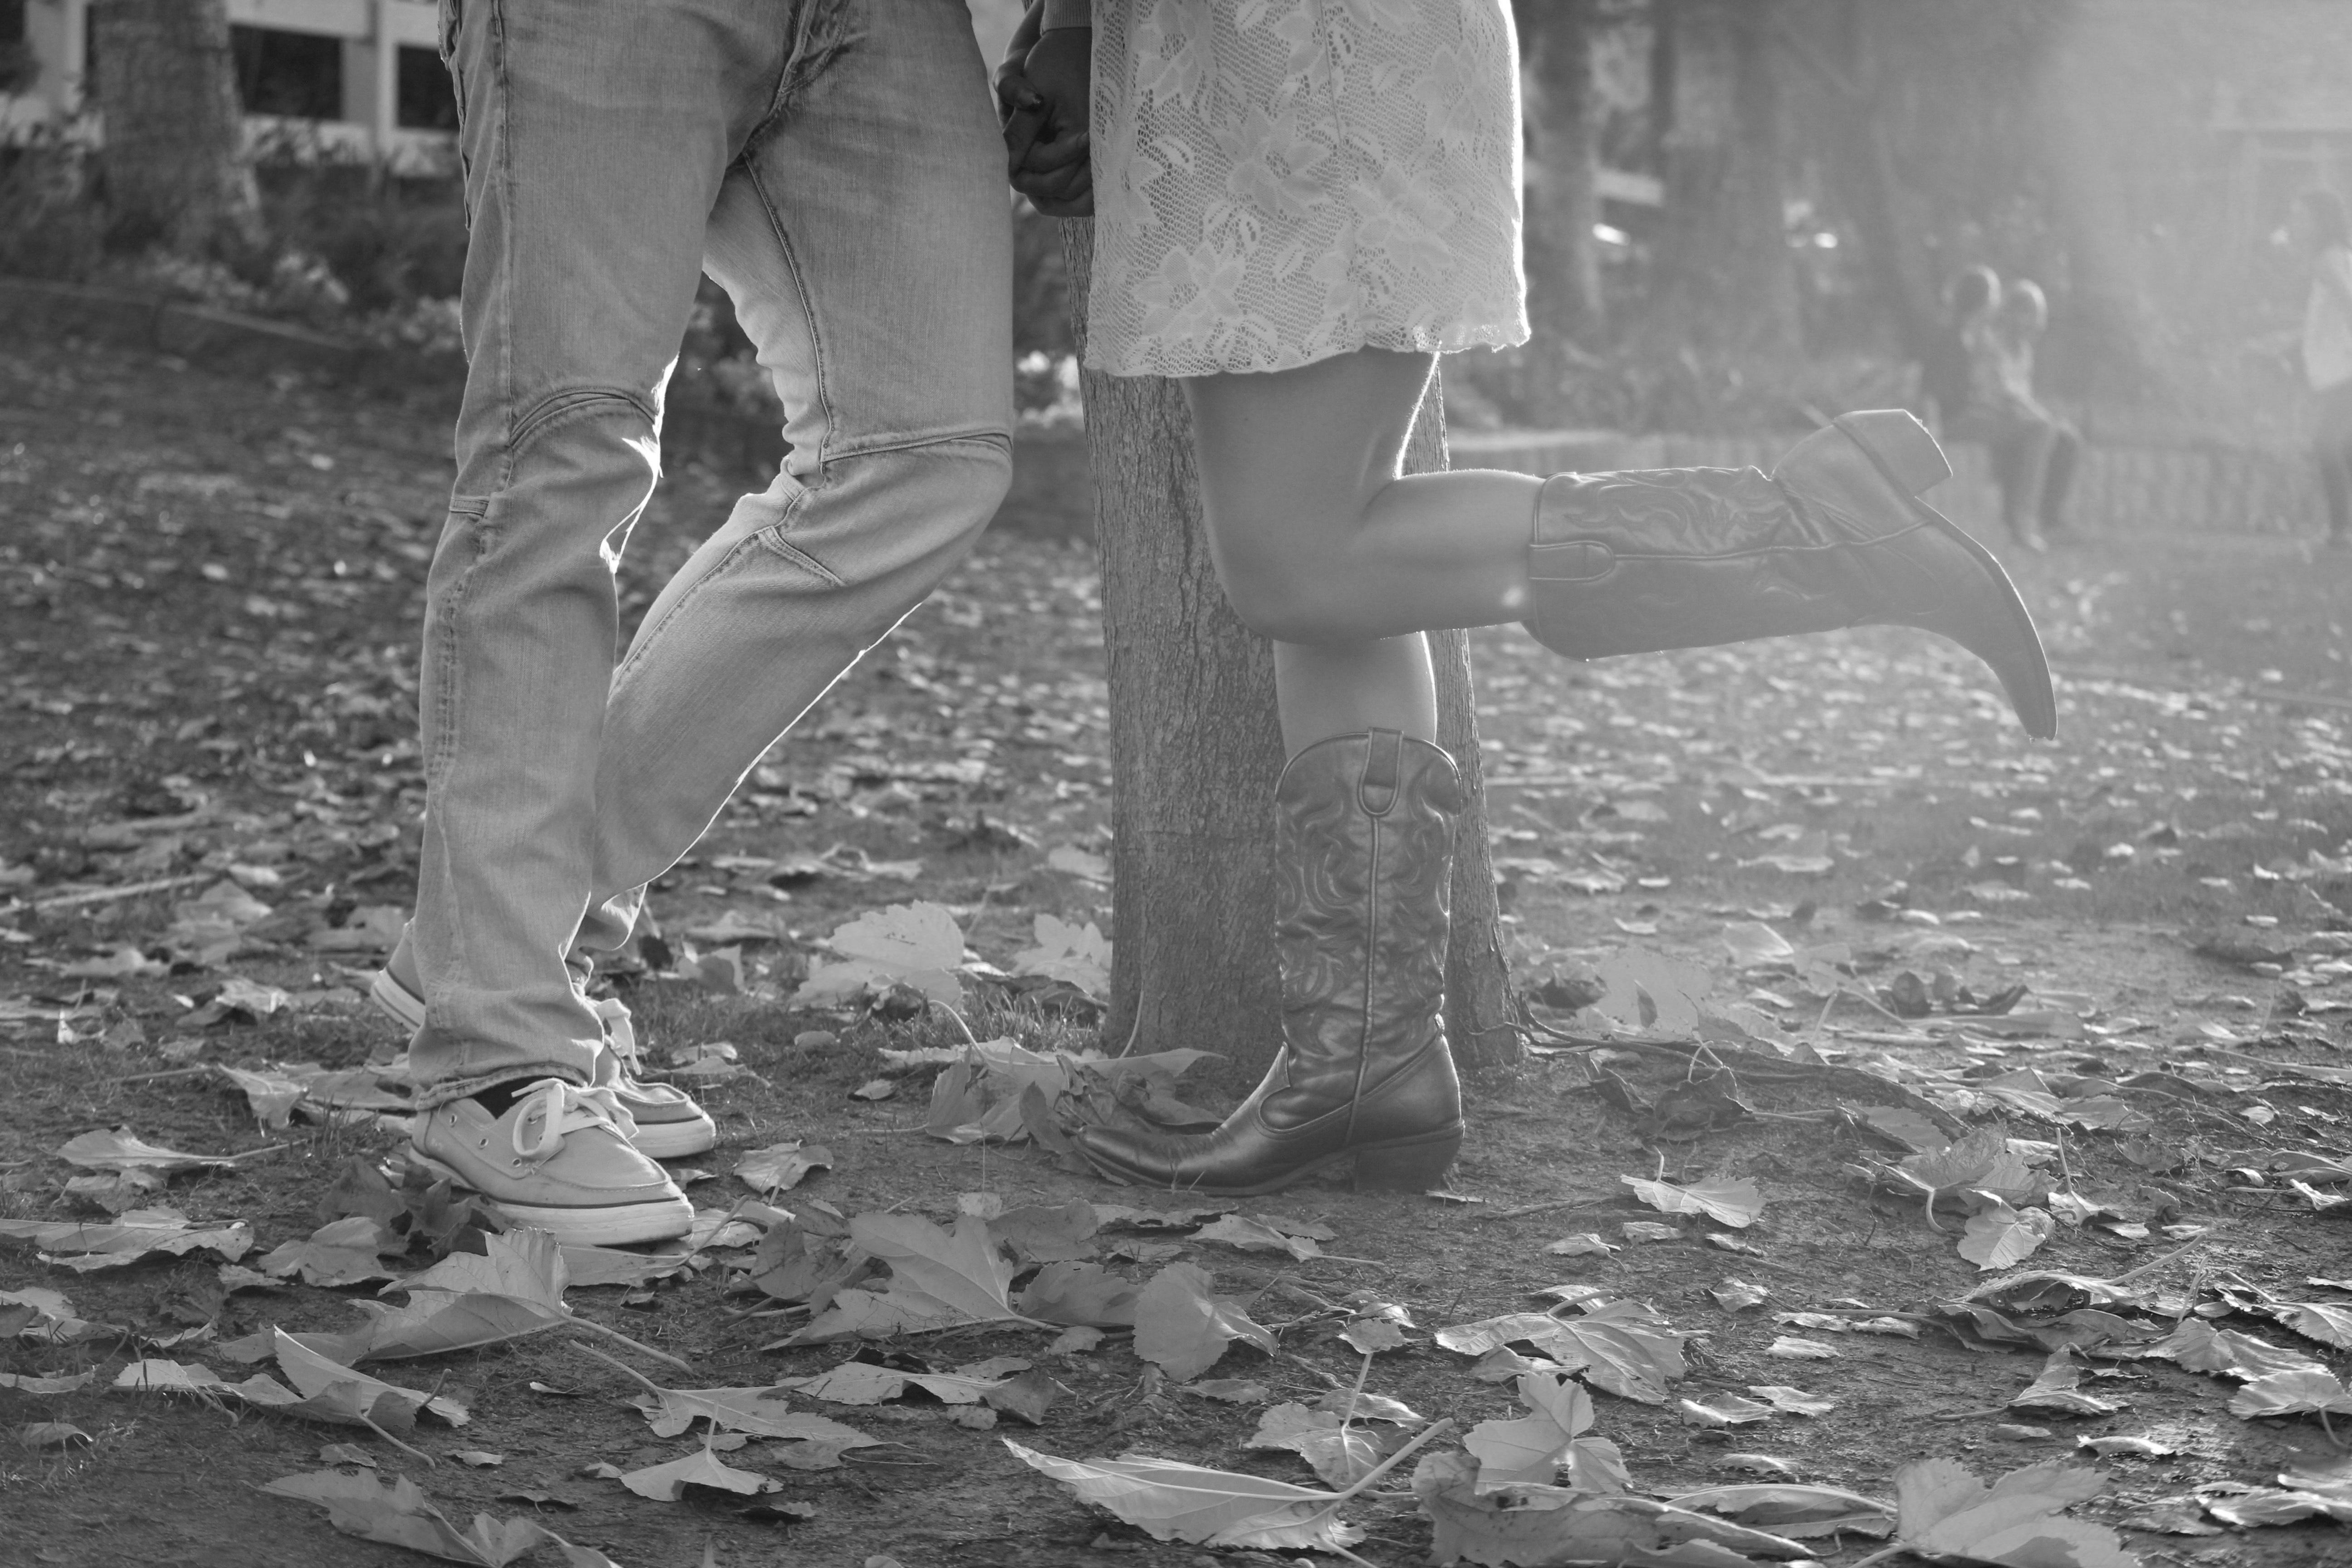 Gambar Hitam Dan Putih Hujan Cinta Musim Semi Musim Gugur